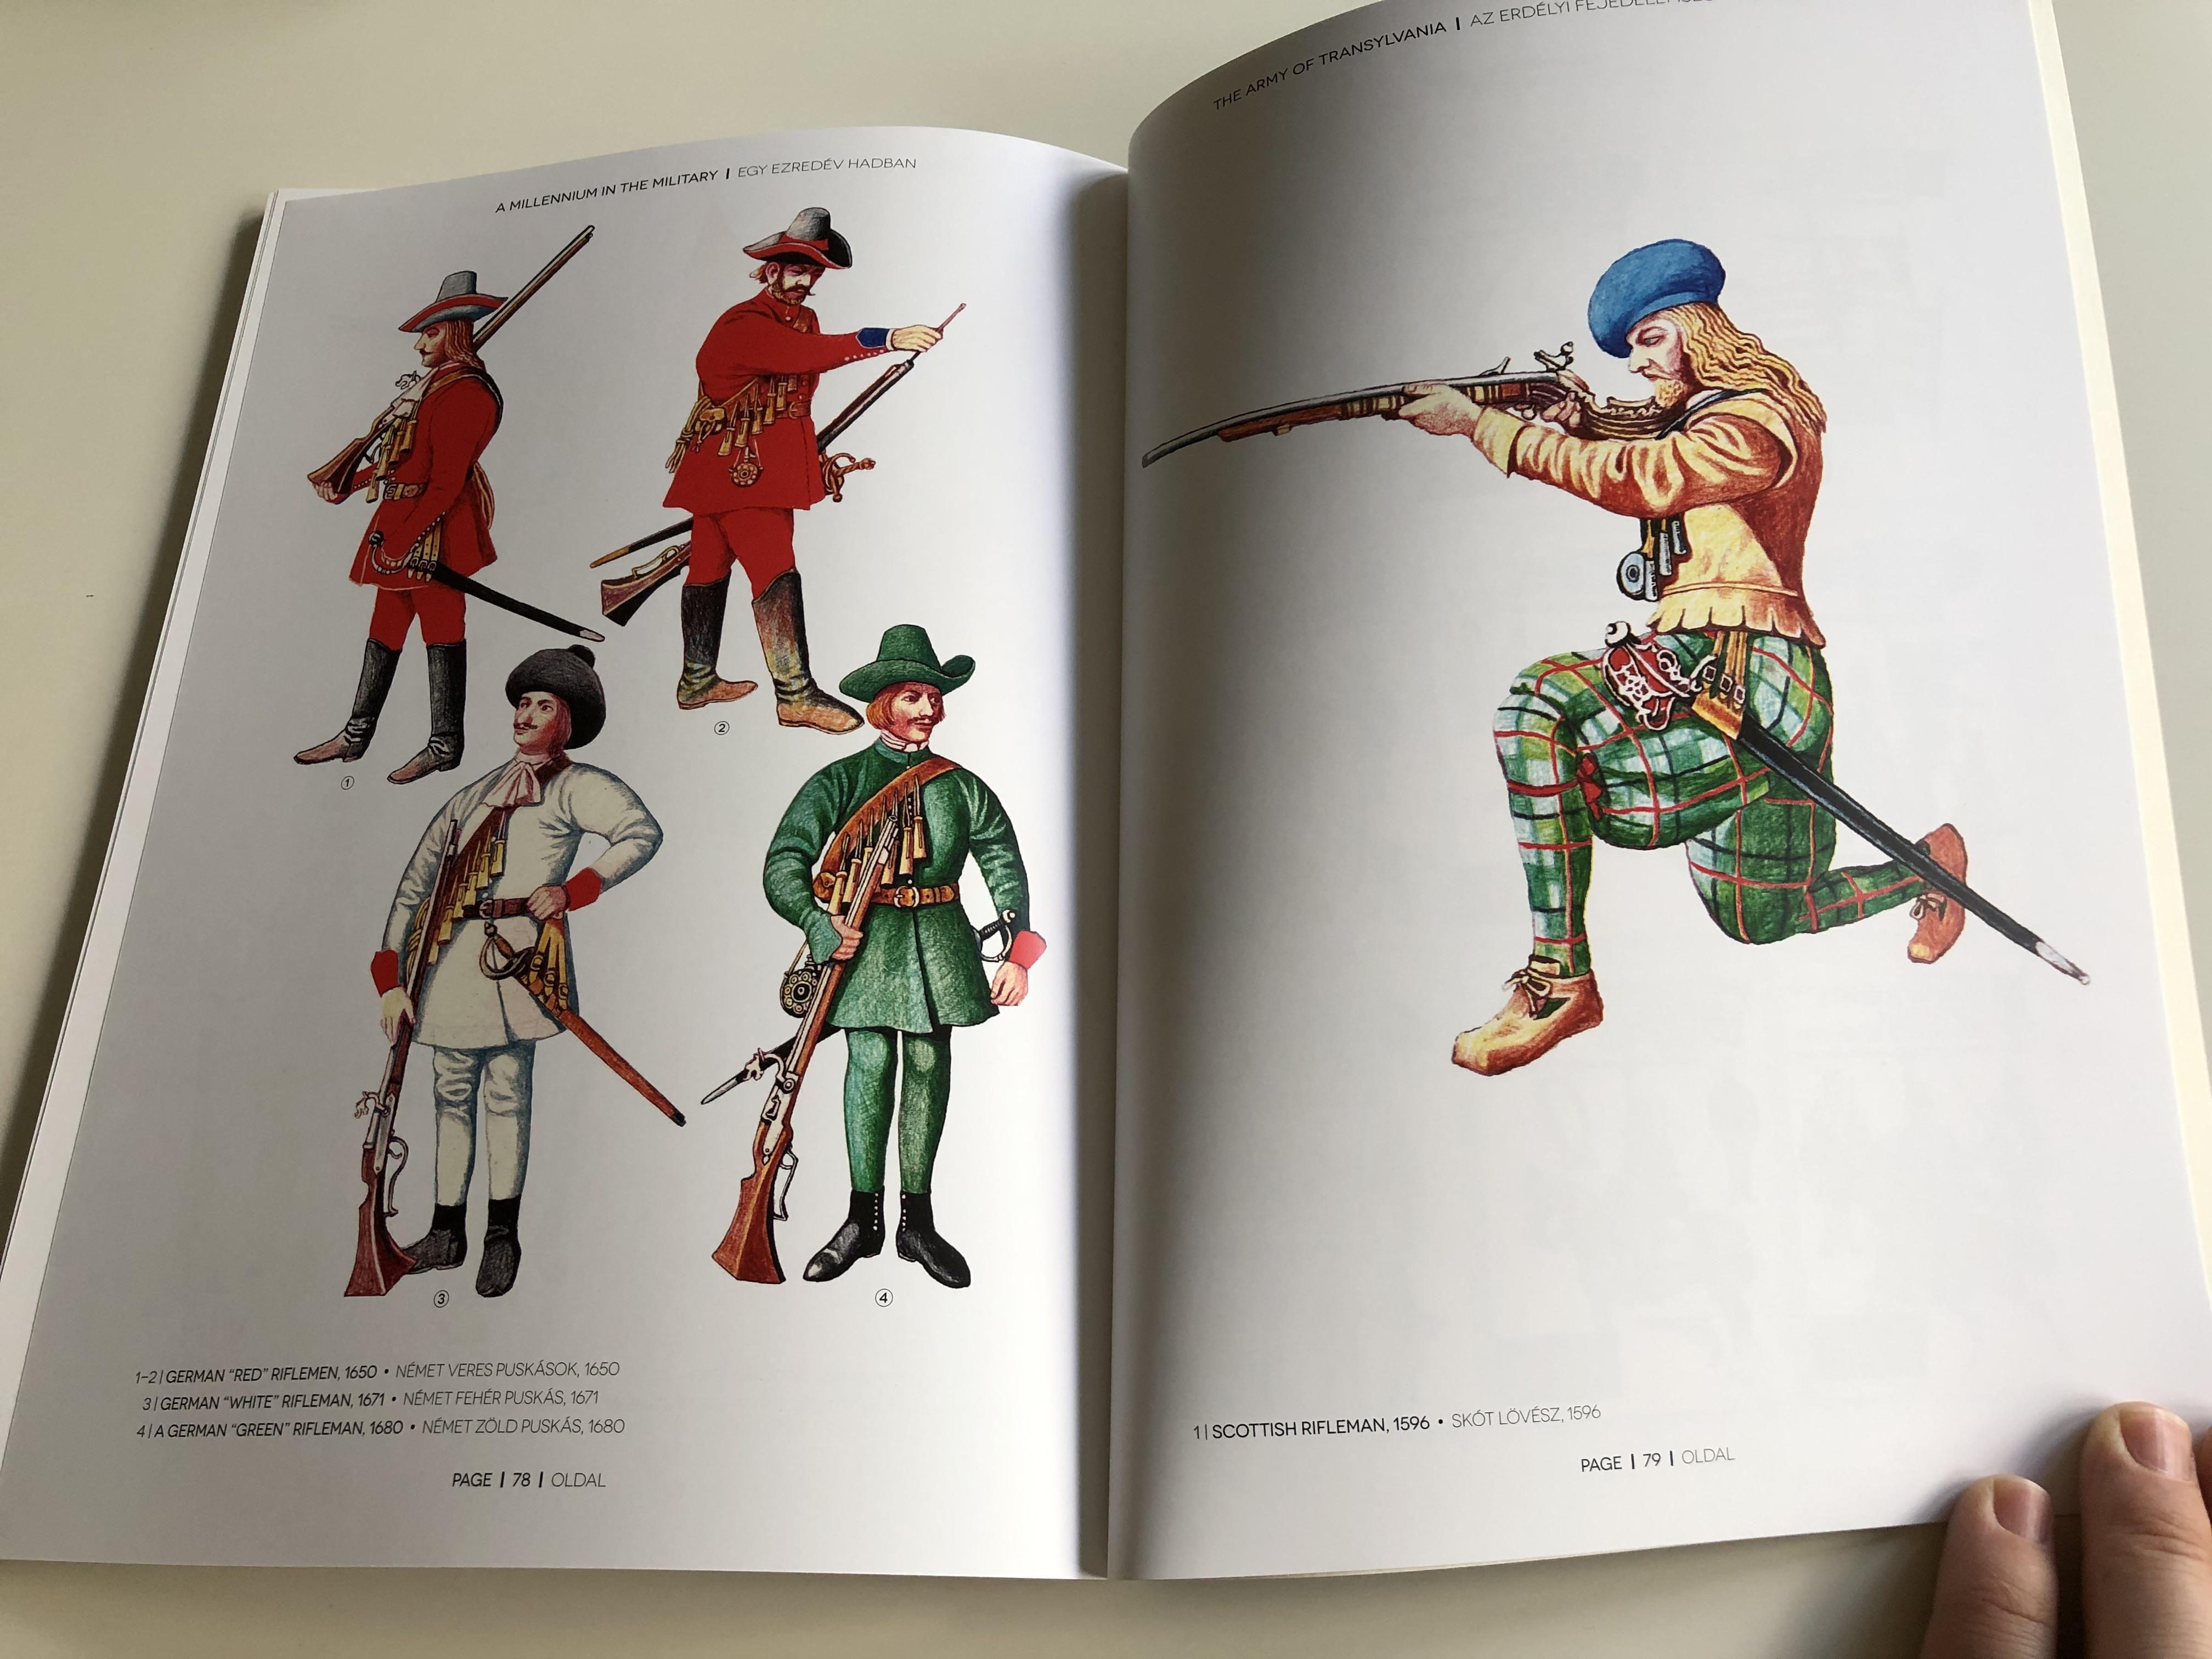 the-army-of-transylvania-1559-1690-by-gy-z-somogyi-az-erd-lyi-fejedelms-g-hadserege-1559-1690-h-bor-k-magyar-a-millenium-in-the-military-egy-ezred-v-hadban-paperback-2016-hm-zr-nyi-11-.jpg